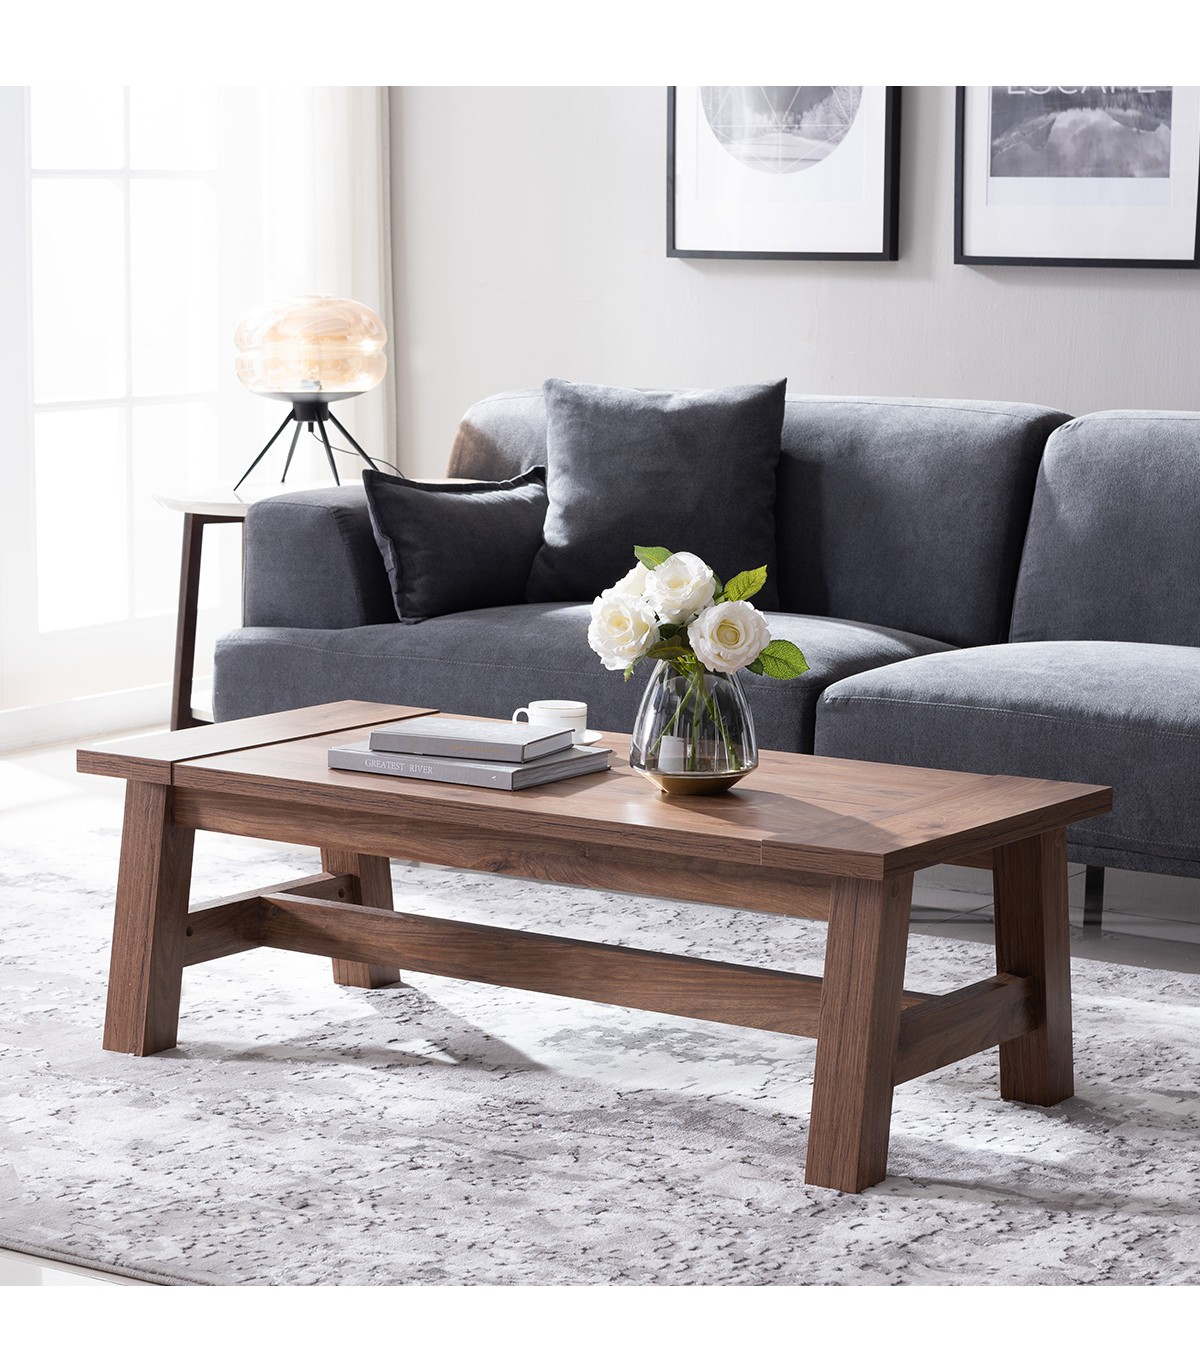 Table basse en bois style campagne - Marron